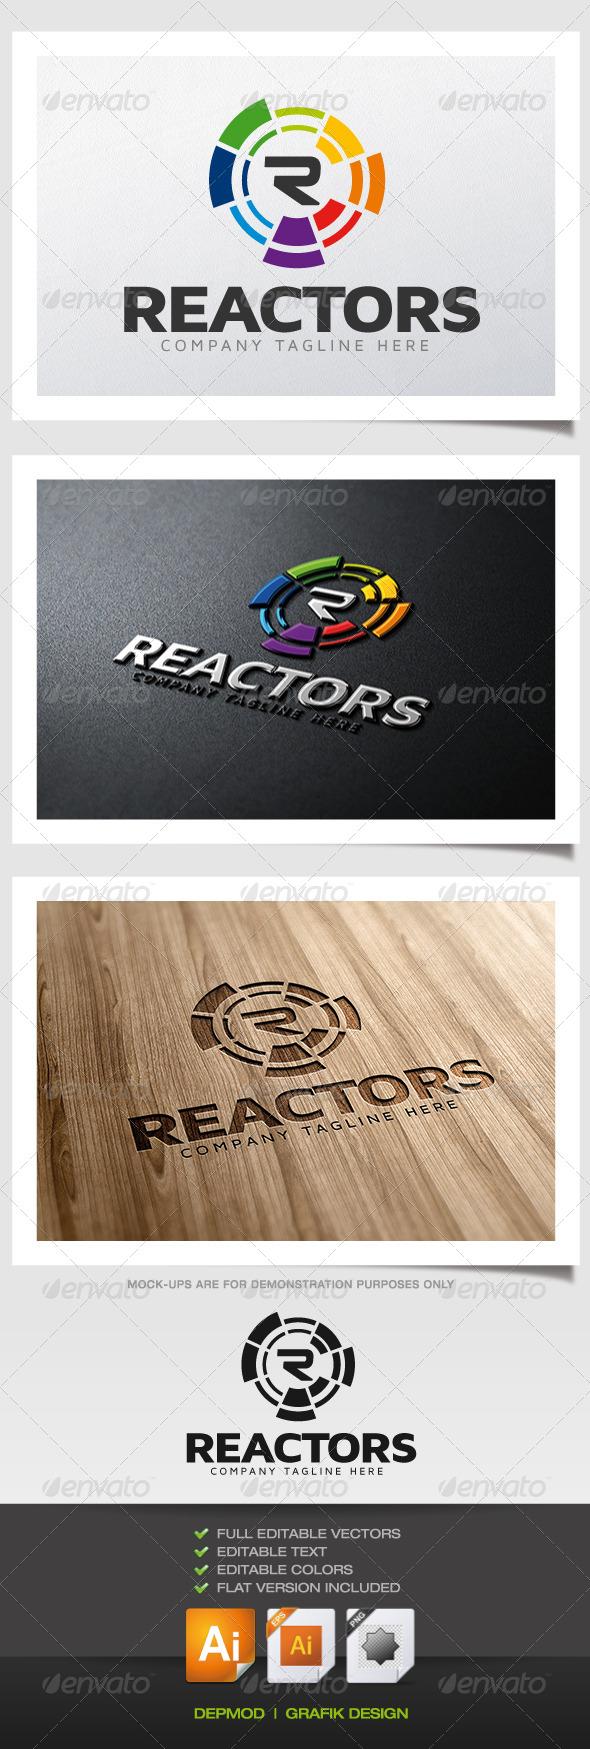 GraphicRiver Reactors Logo 5838760